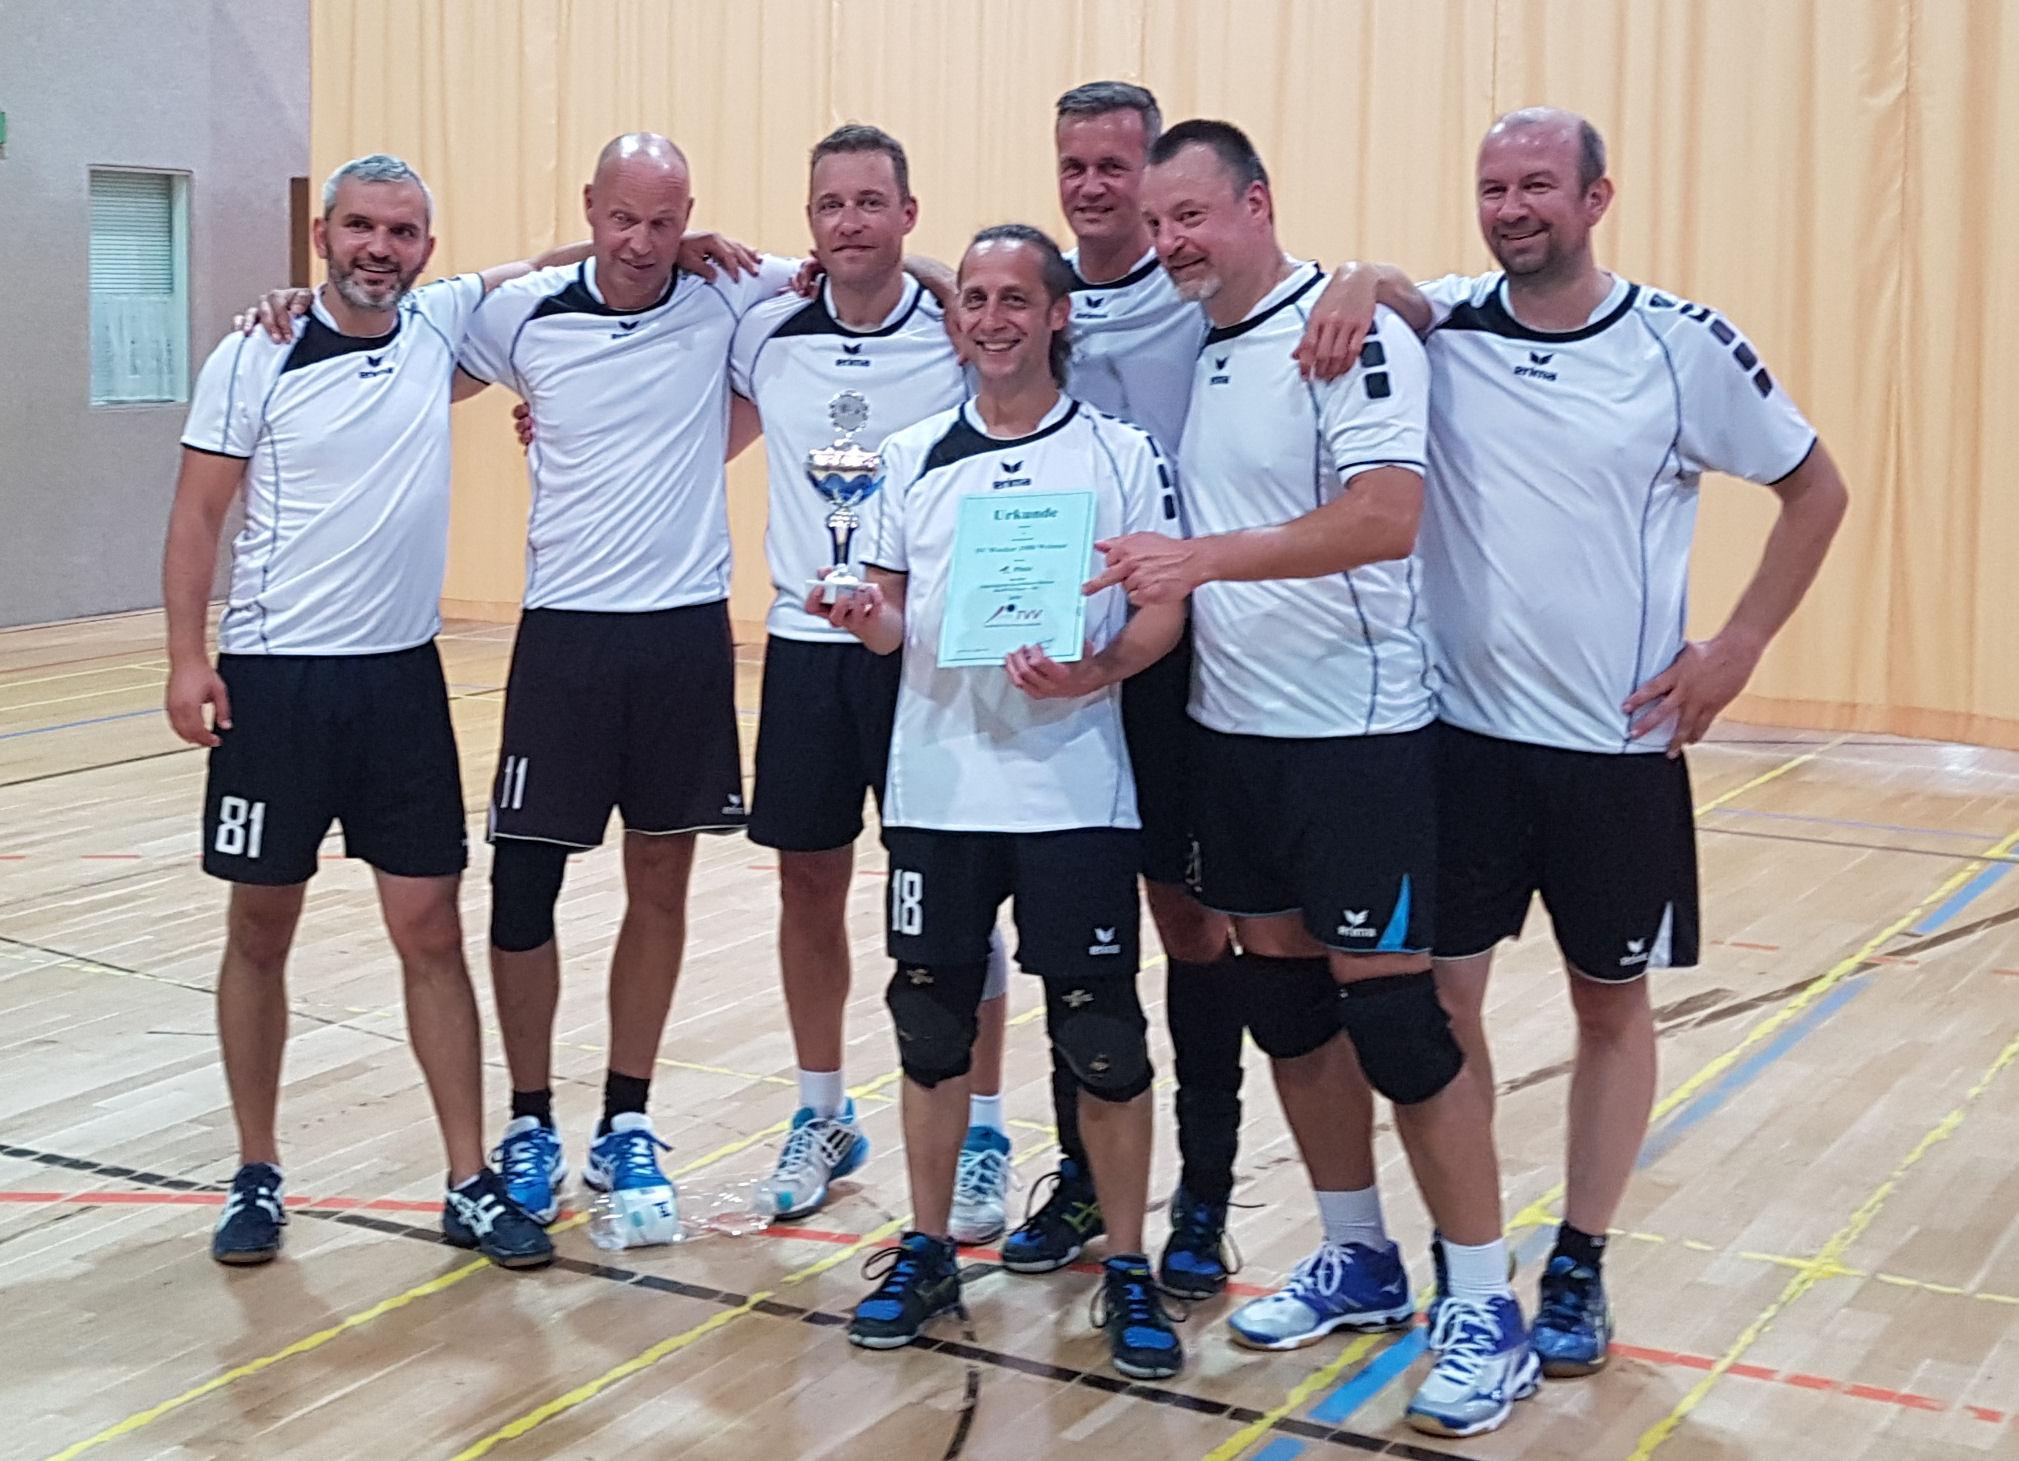 Gewinner des Supercups 2018/2019   SV Wacker 1980 Weimar